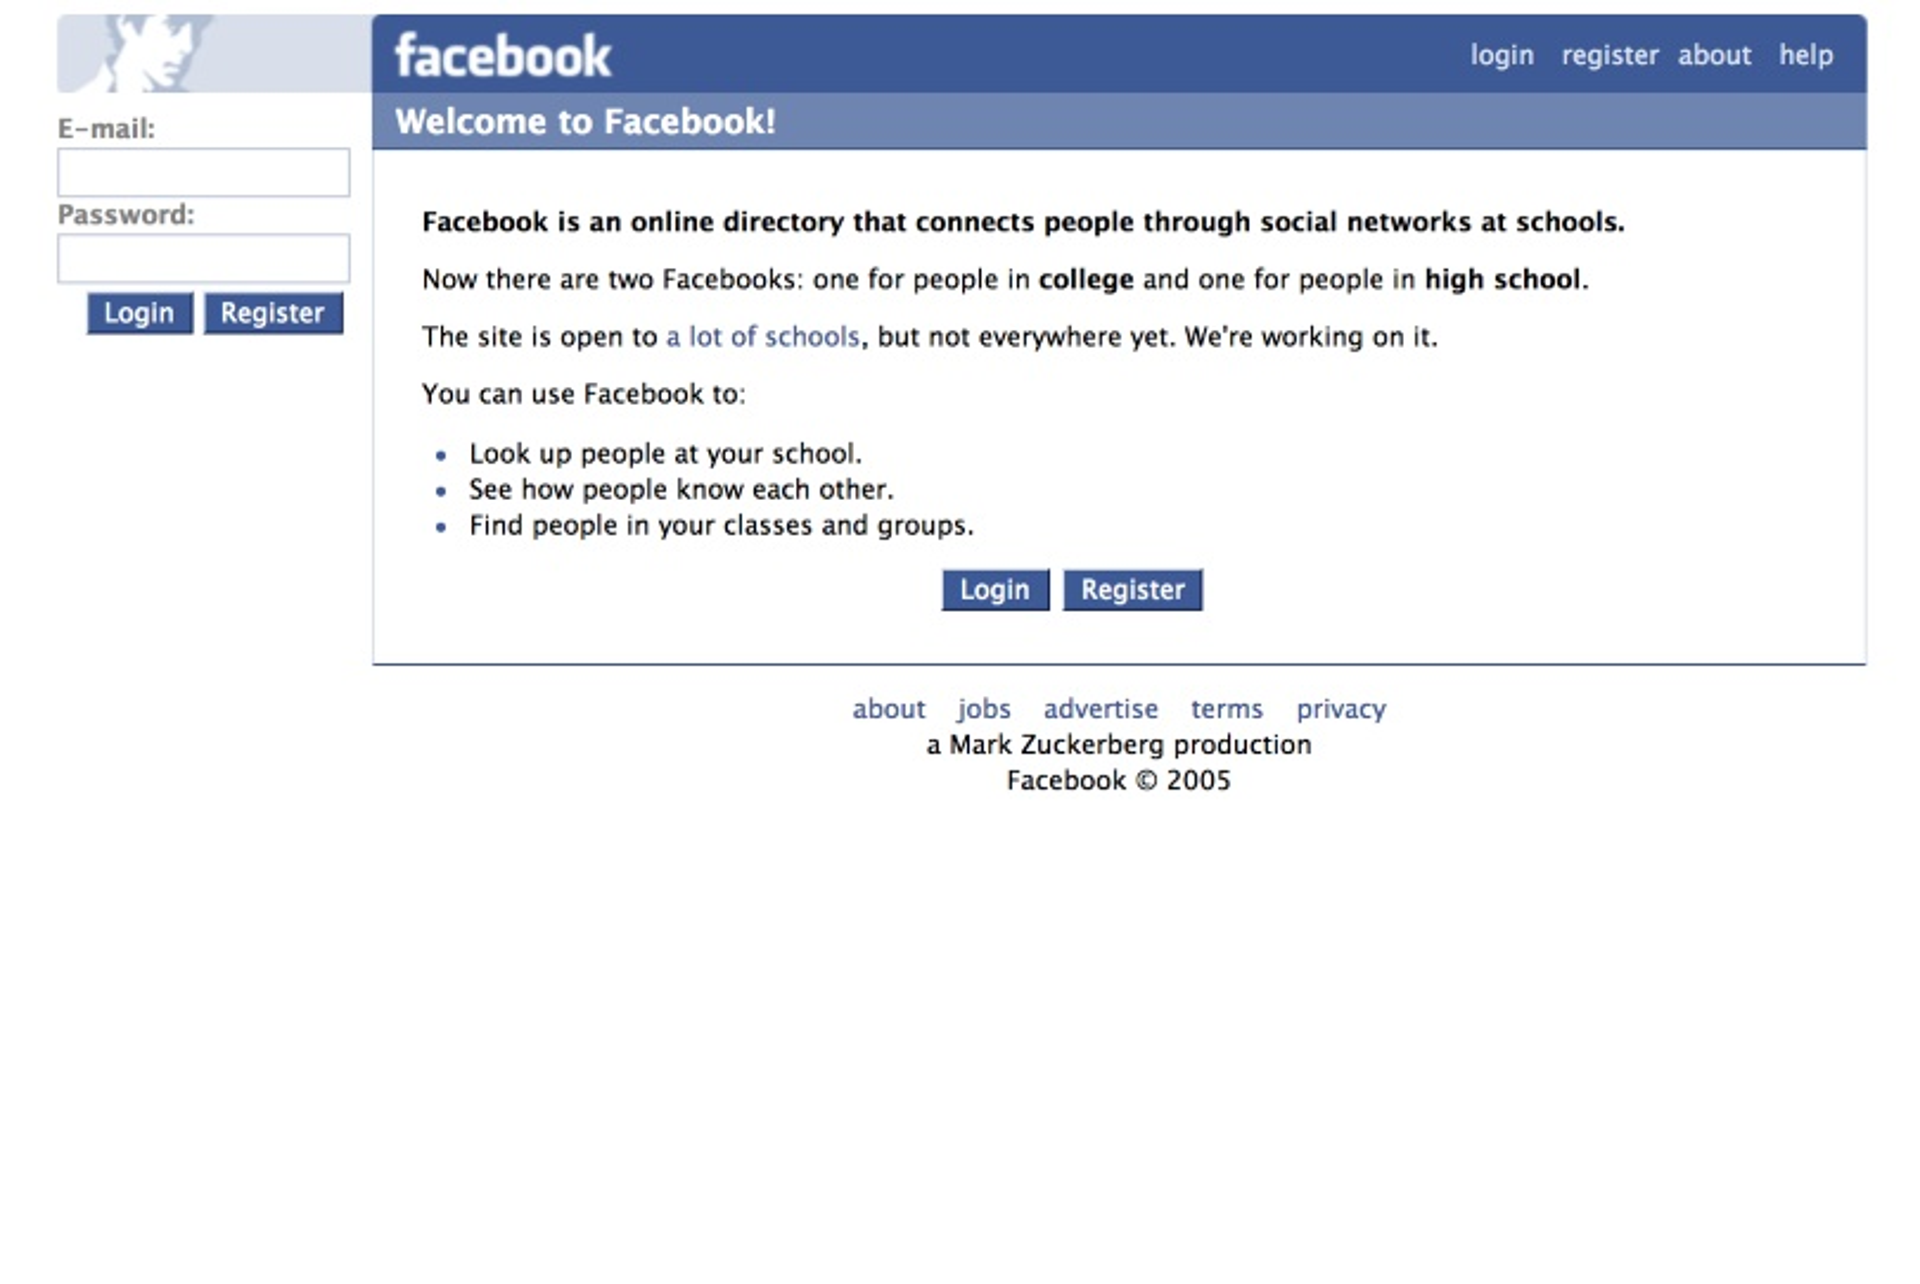 Archivio siti Web, Facebook del 2004